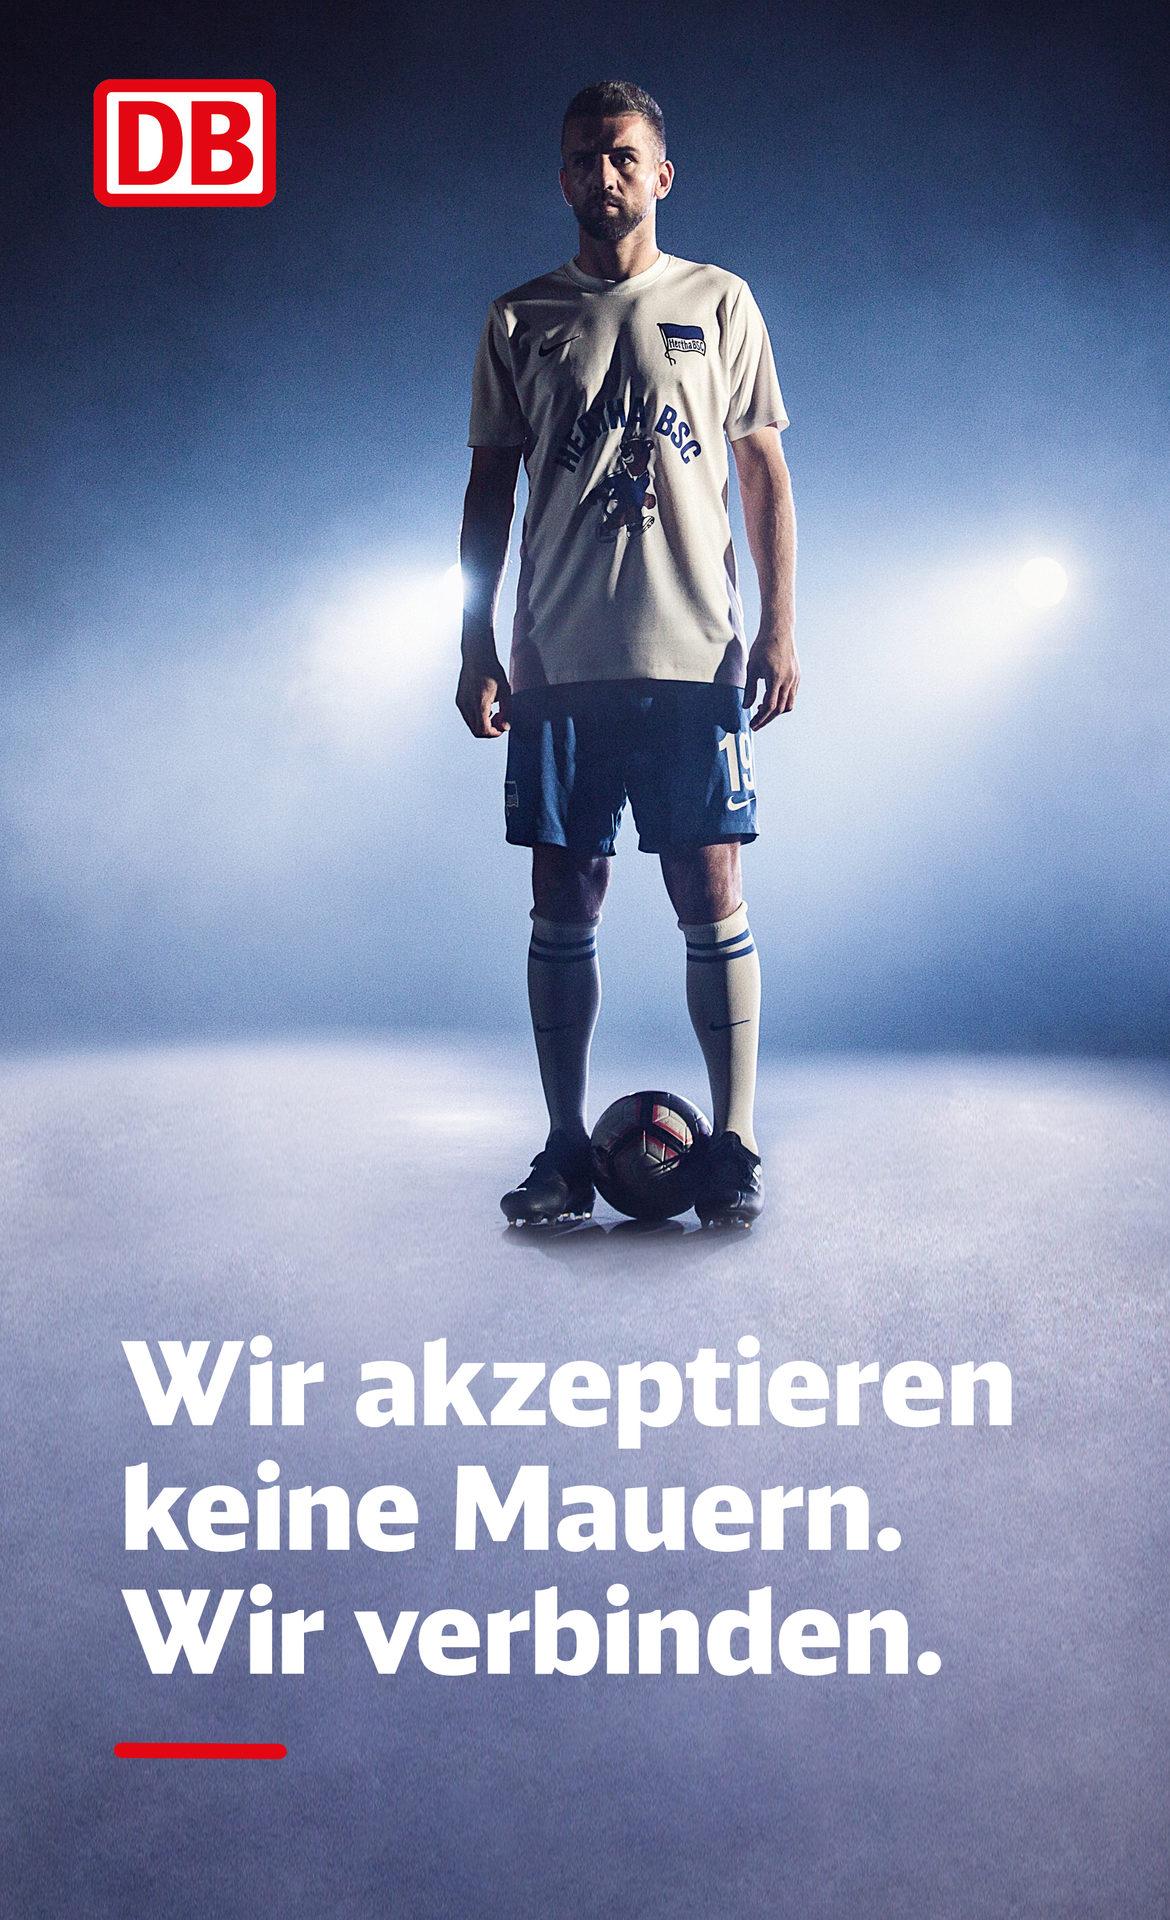 19_32_fA_DB_Hertha_Final_2 1.jpg